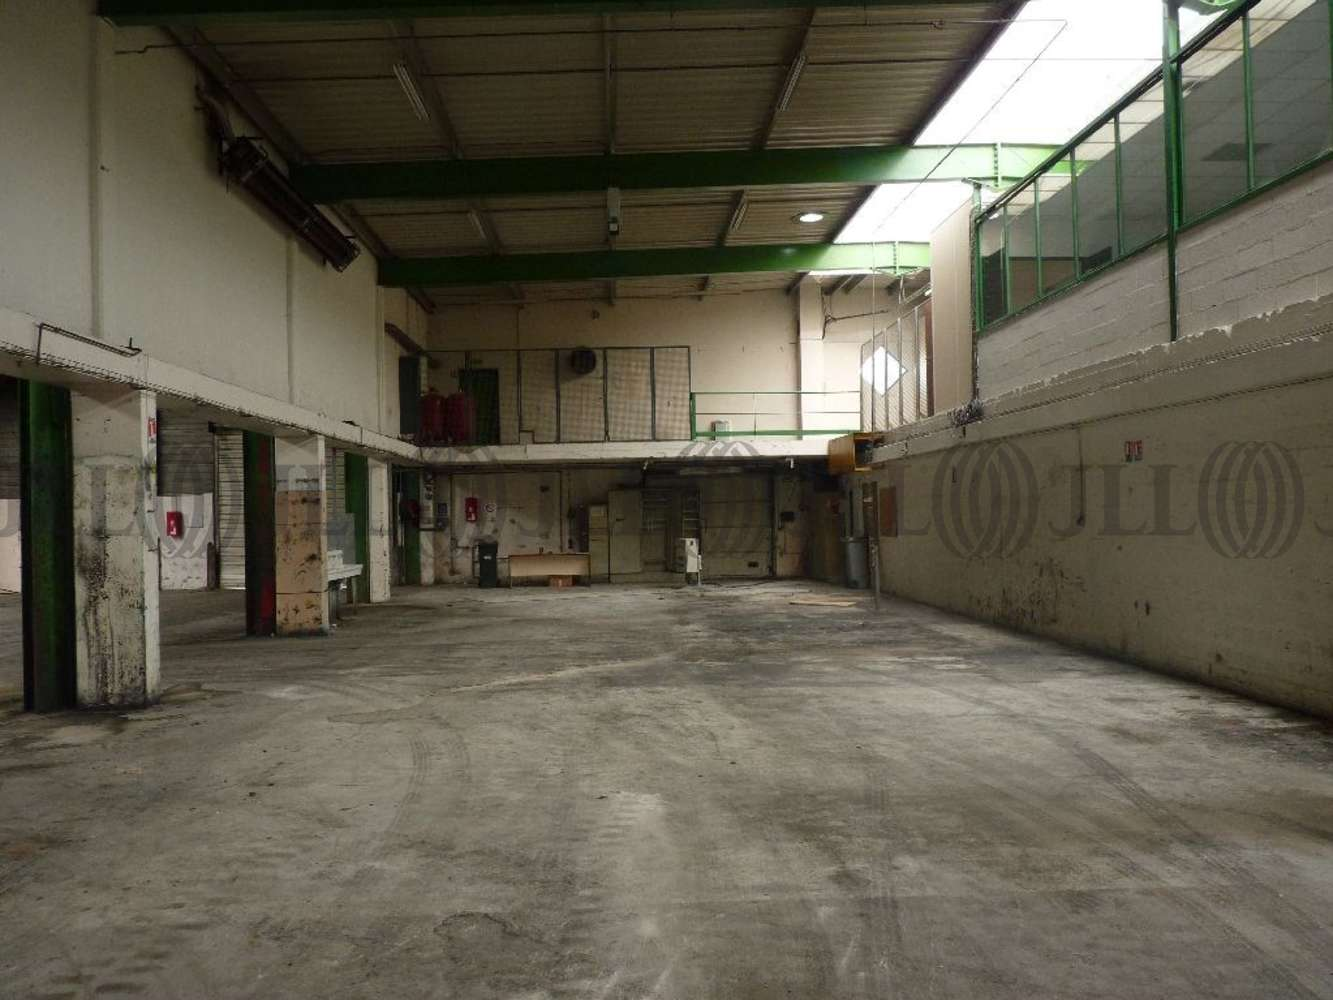 Activités/entrepôt Genas, 69740 - Location entrepot Genas - Lyon Est (69) - 10322580